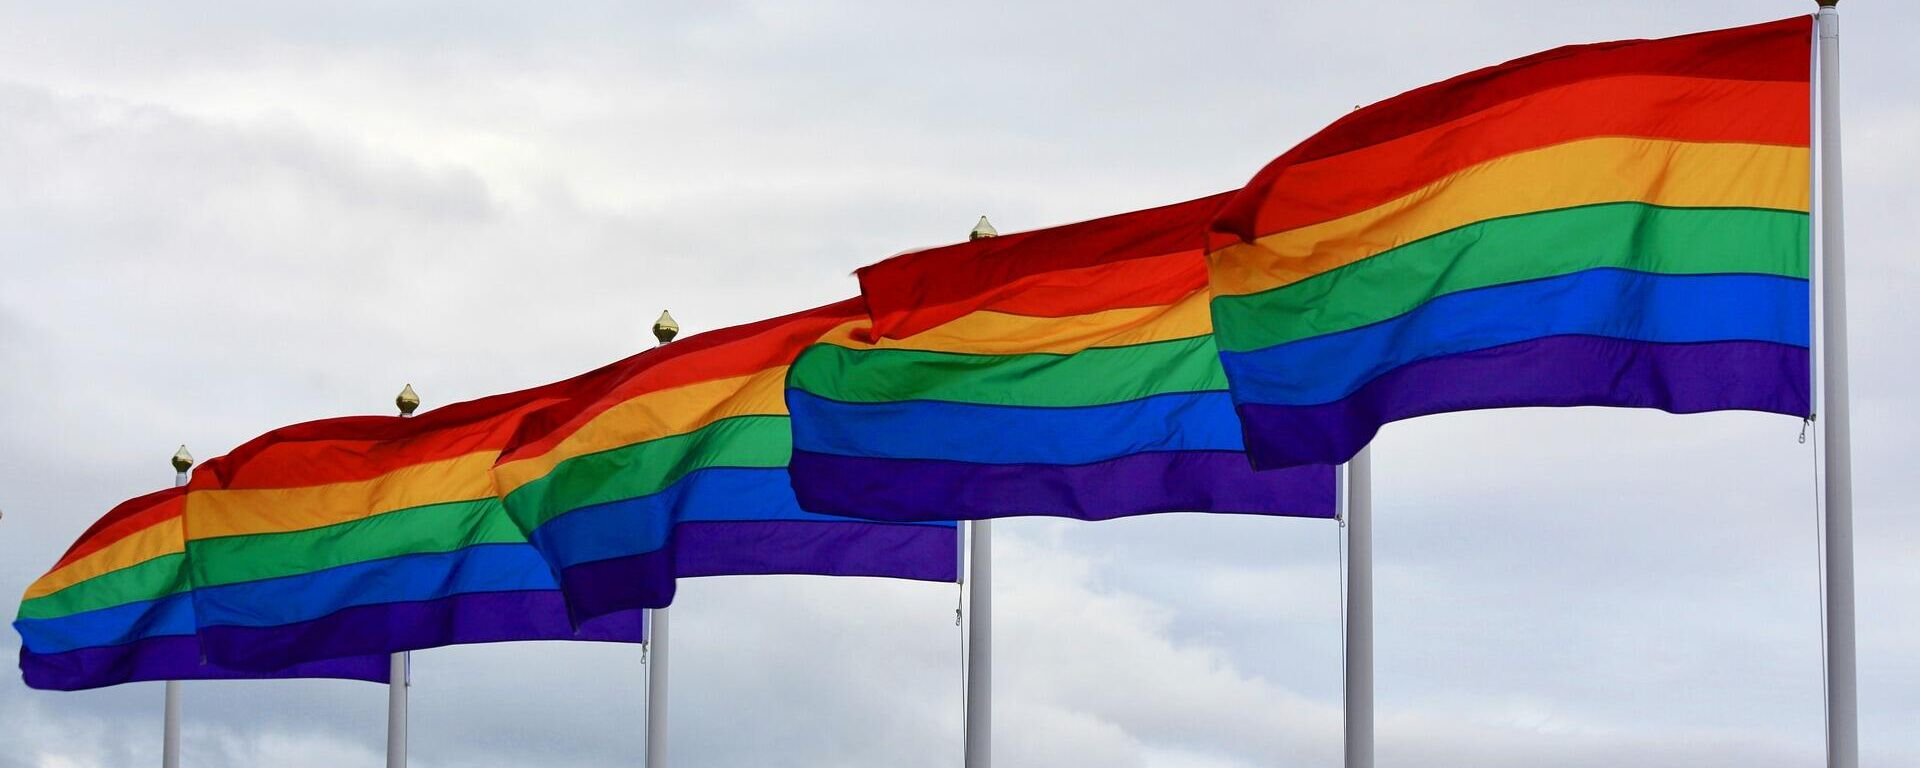 LGBT-Flagge (Symbolbild) - SNA, 1920, 28.06.2021